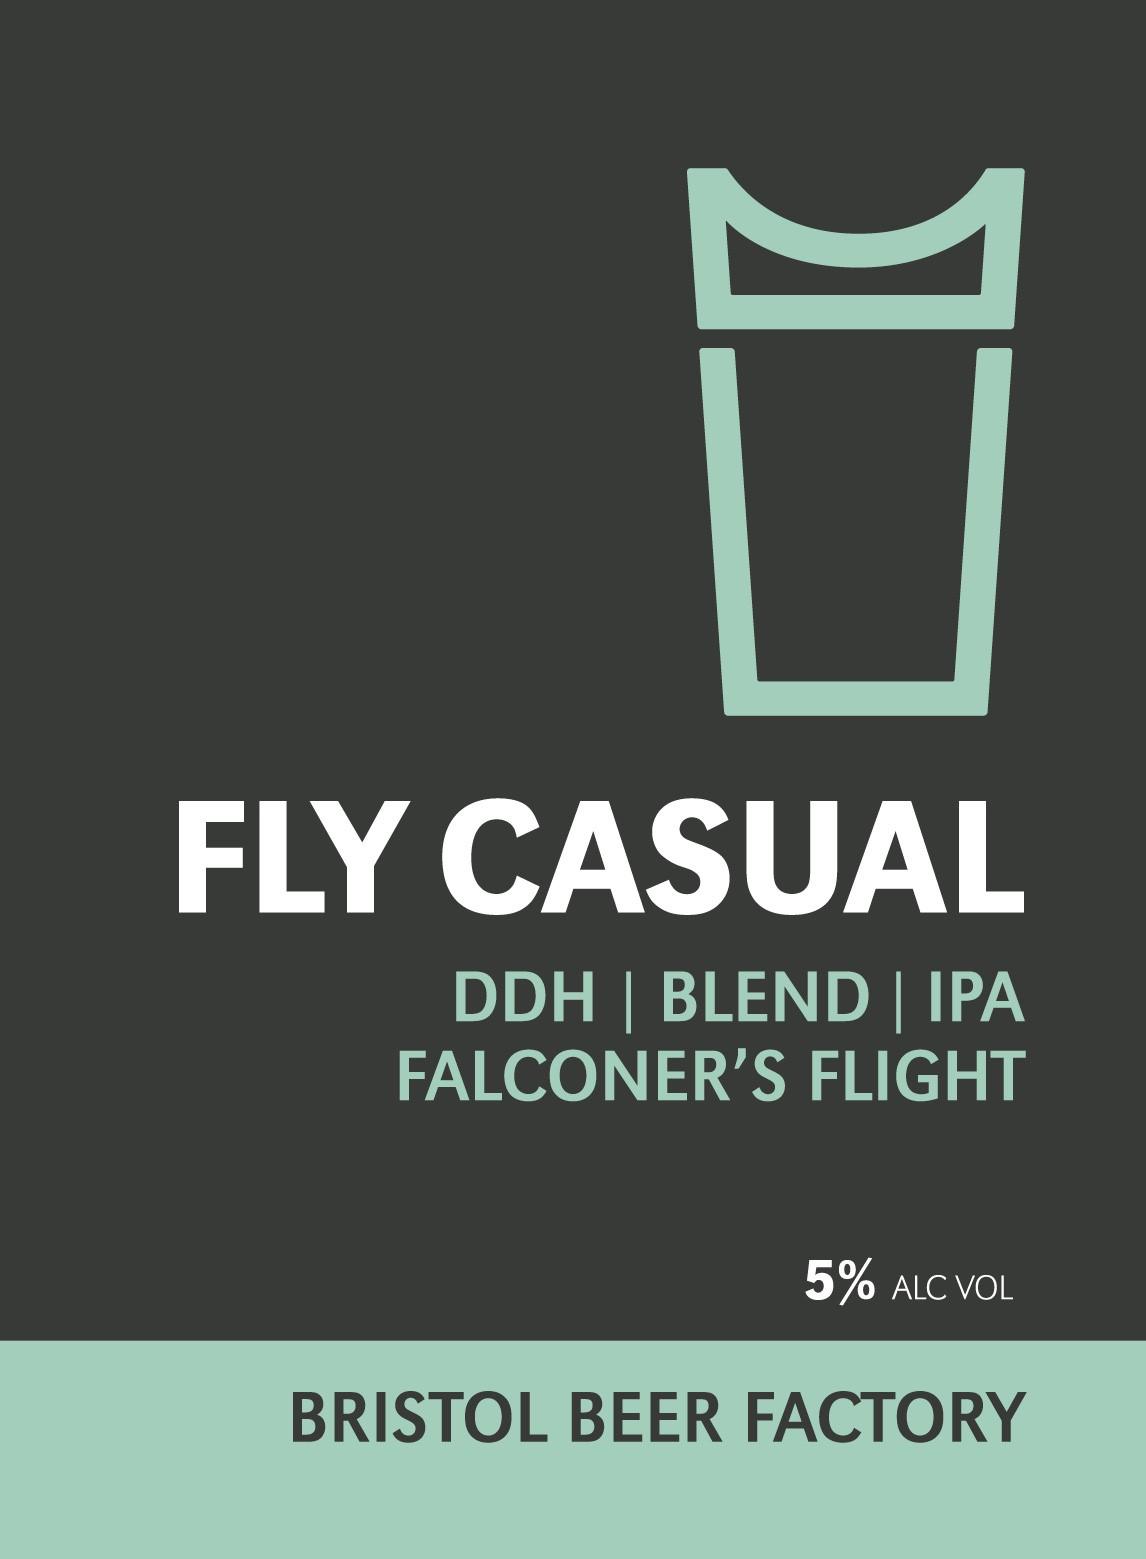 BBF FLY CASUAL.jpg